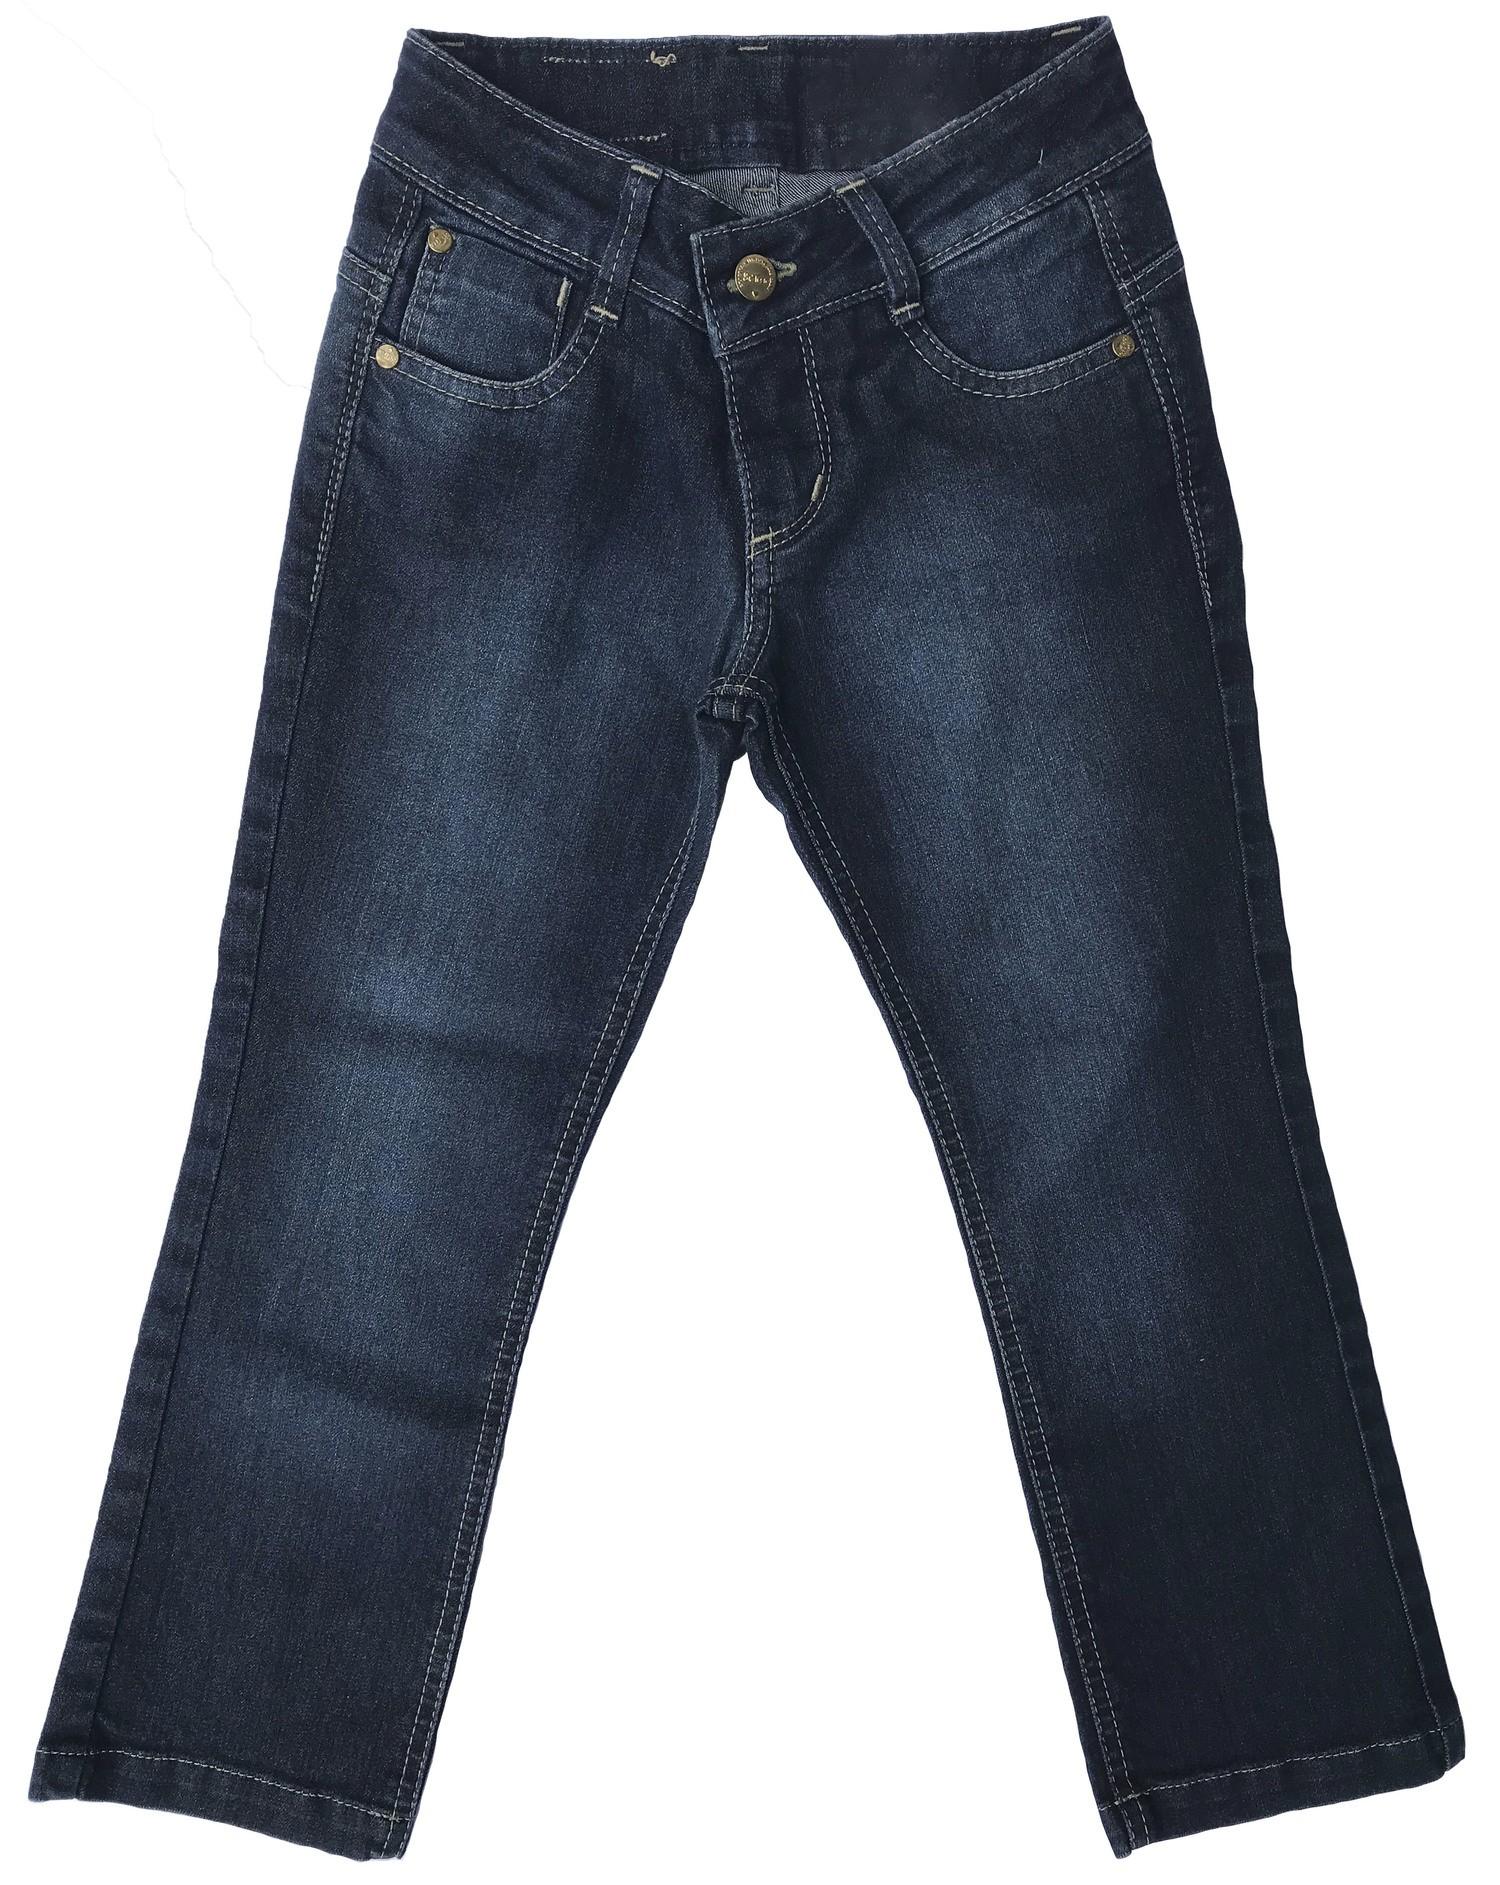 Calça Jeans Feminina Infantil [TV004]